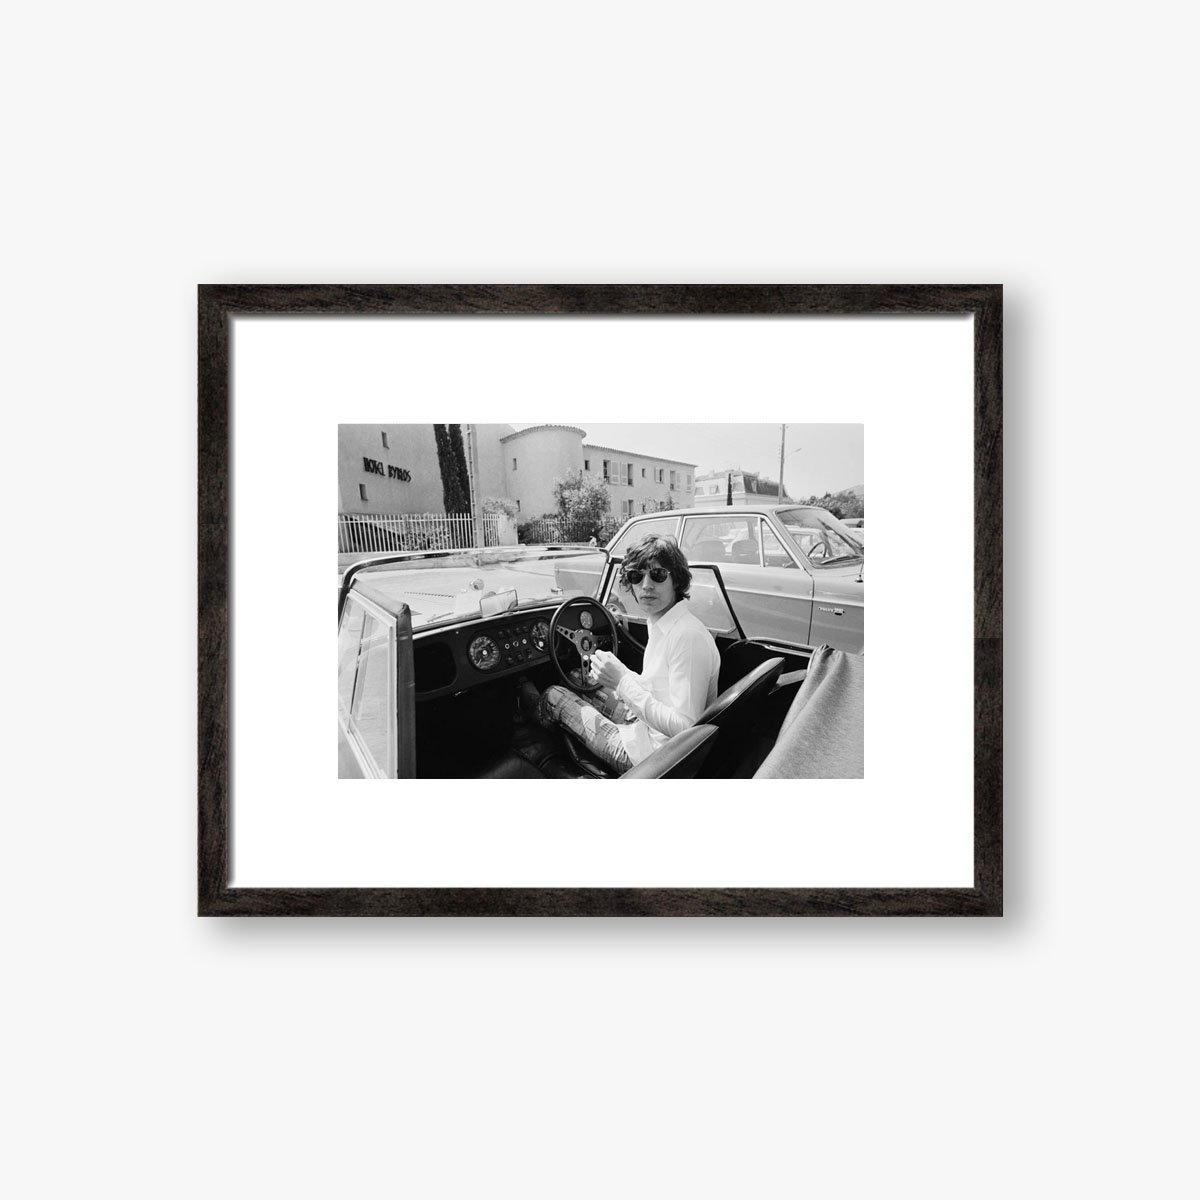 Mick Jagger In France by Reg Lancaster